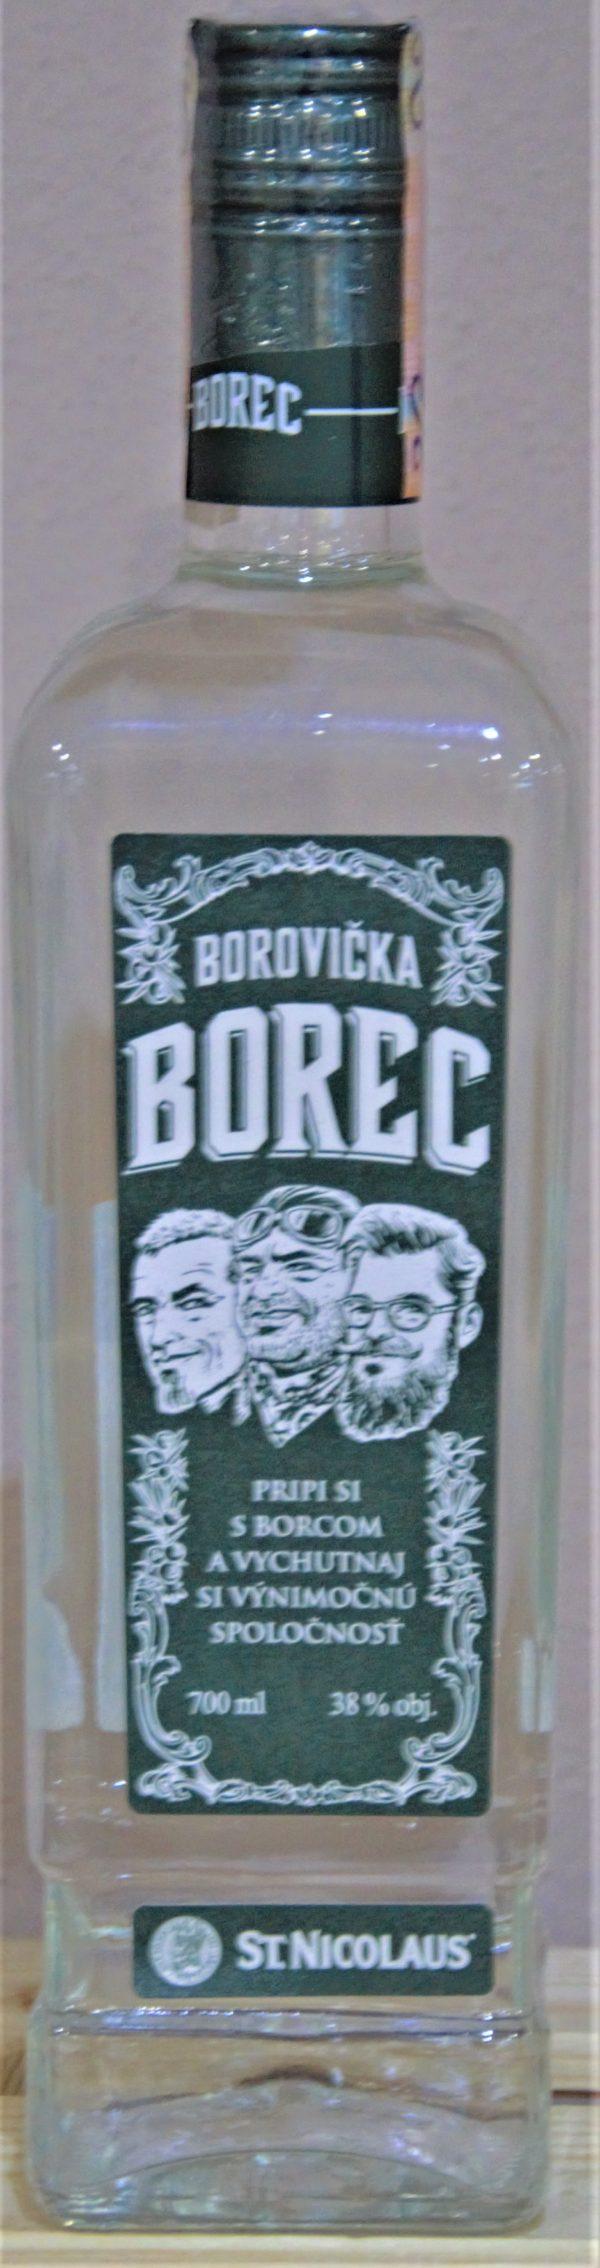 Borovička Borec 38%